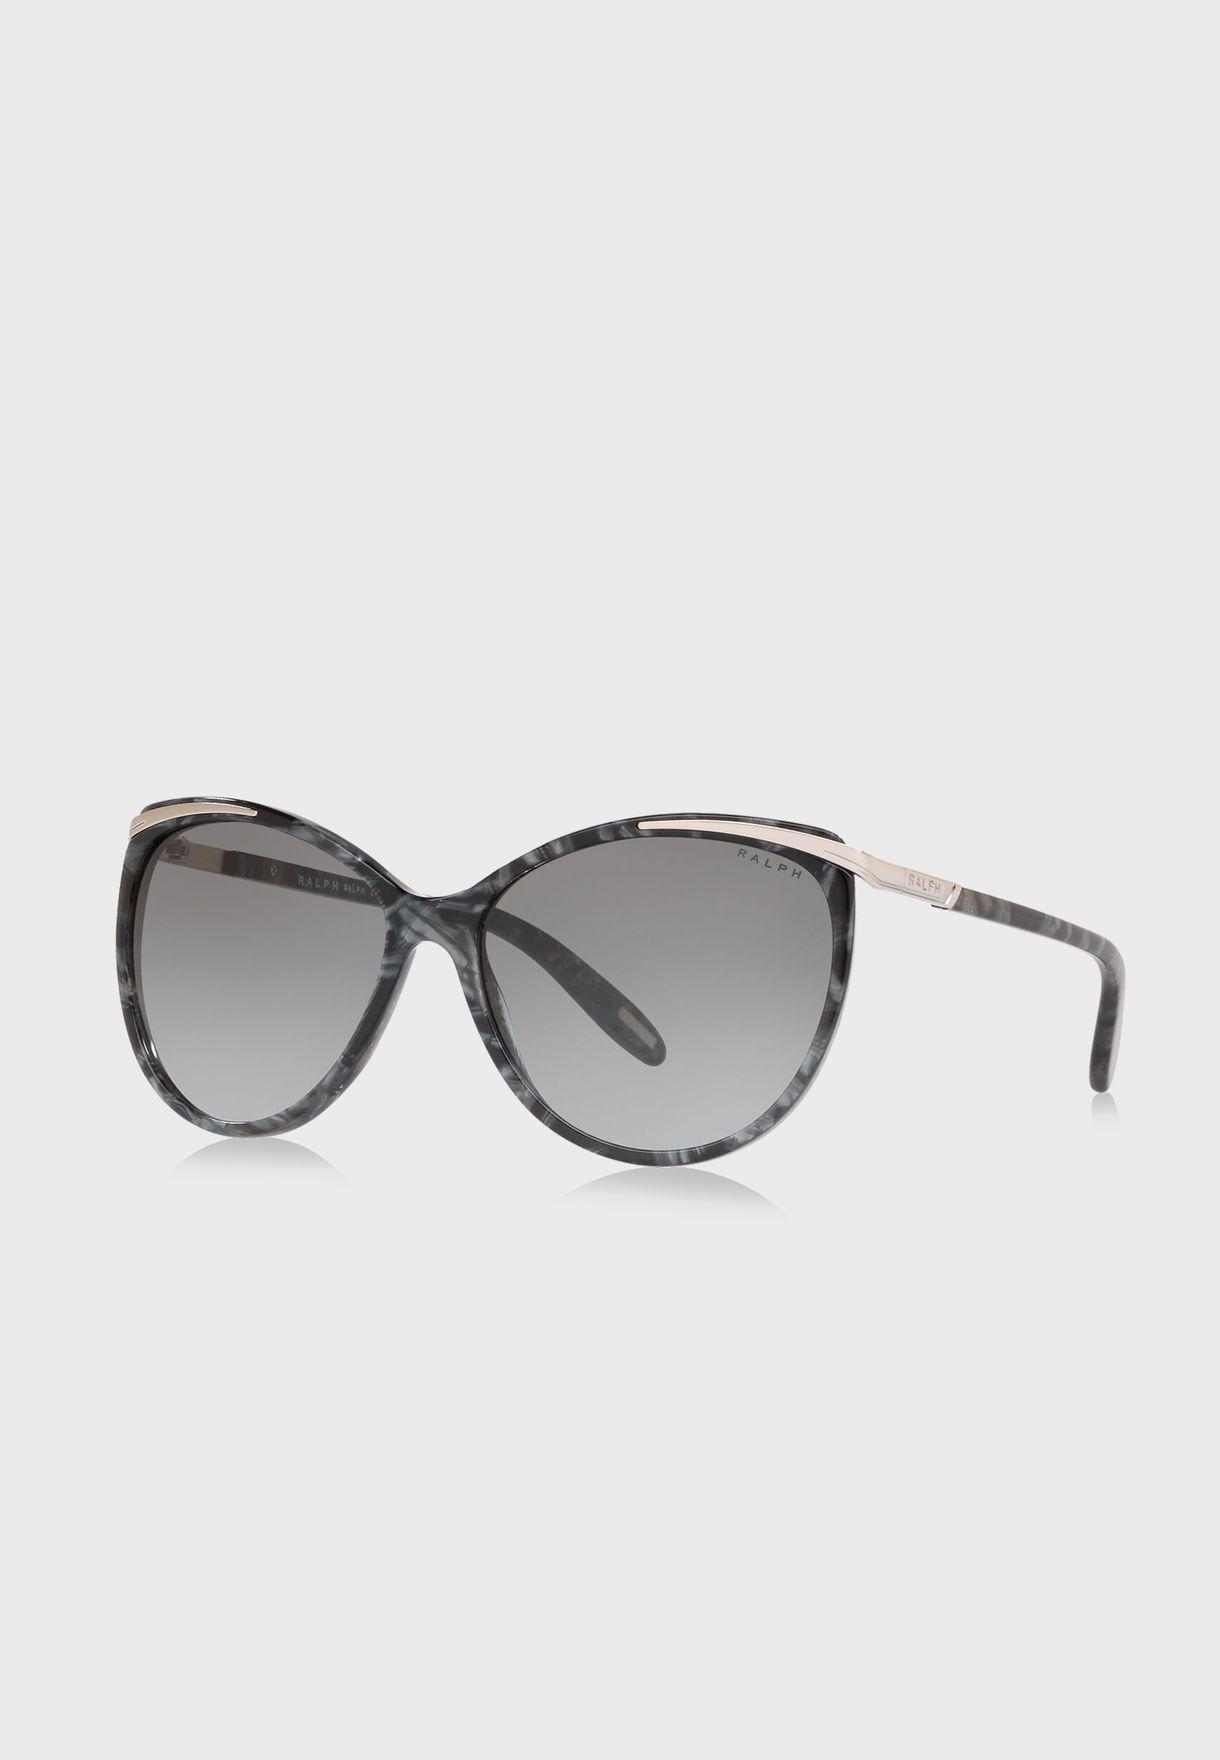 0RA5150 Cateye Oversized Sunglasses